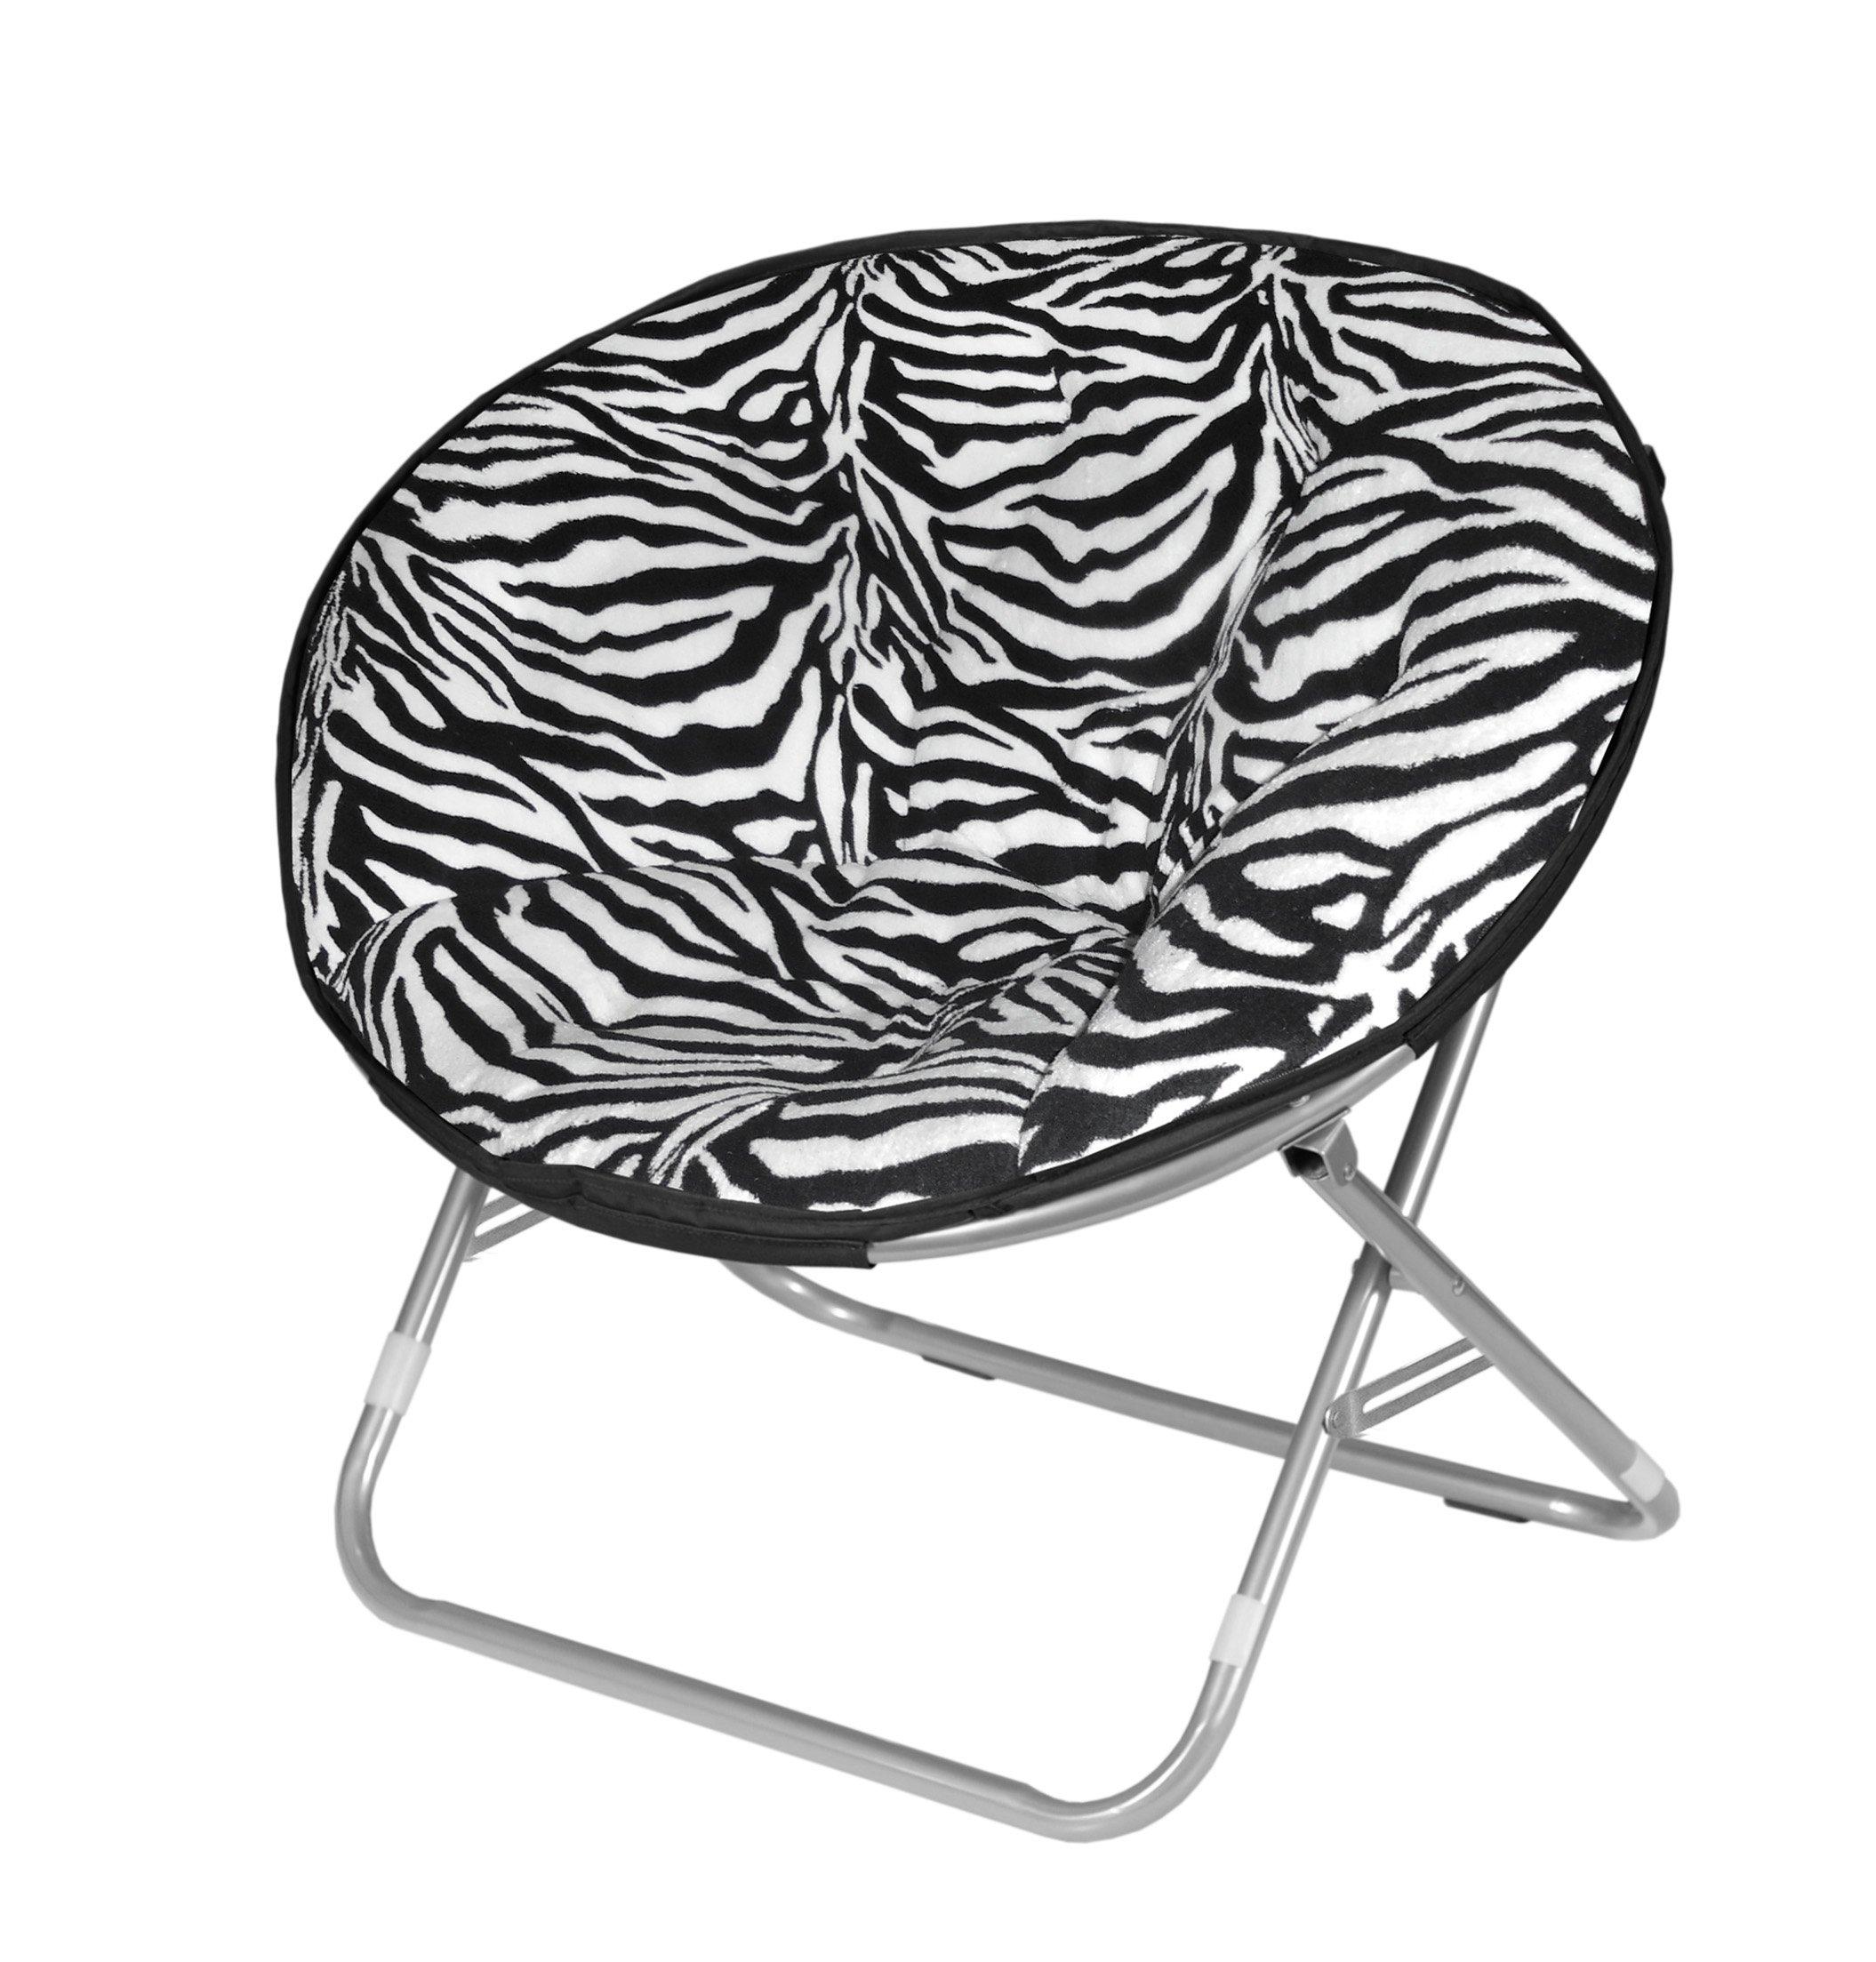 Urban Shop Zebra Faux Fur Saucer Chair by Urban Shop